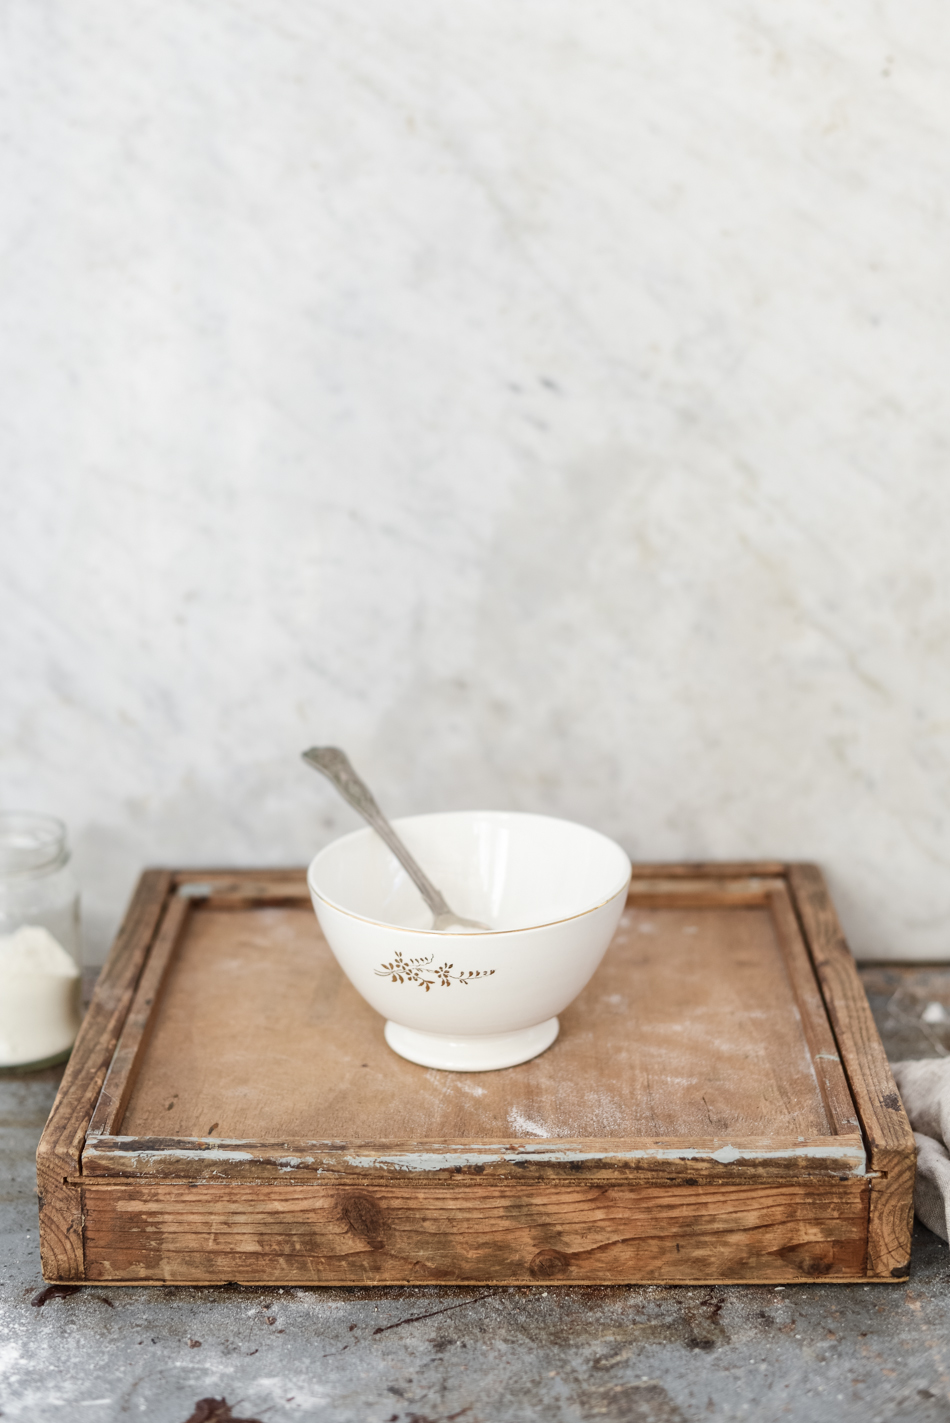 10g di miele liquido,4 cucchiai di farina di grano, 40 ml di latte intero.Unite gli ingredienti in una terrina. Applicate la maschera e lasciate agire per 10 minuti.